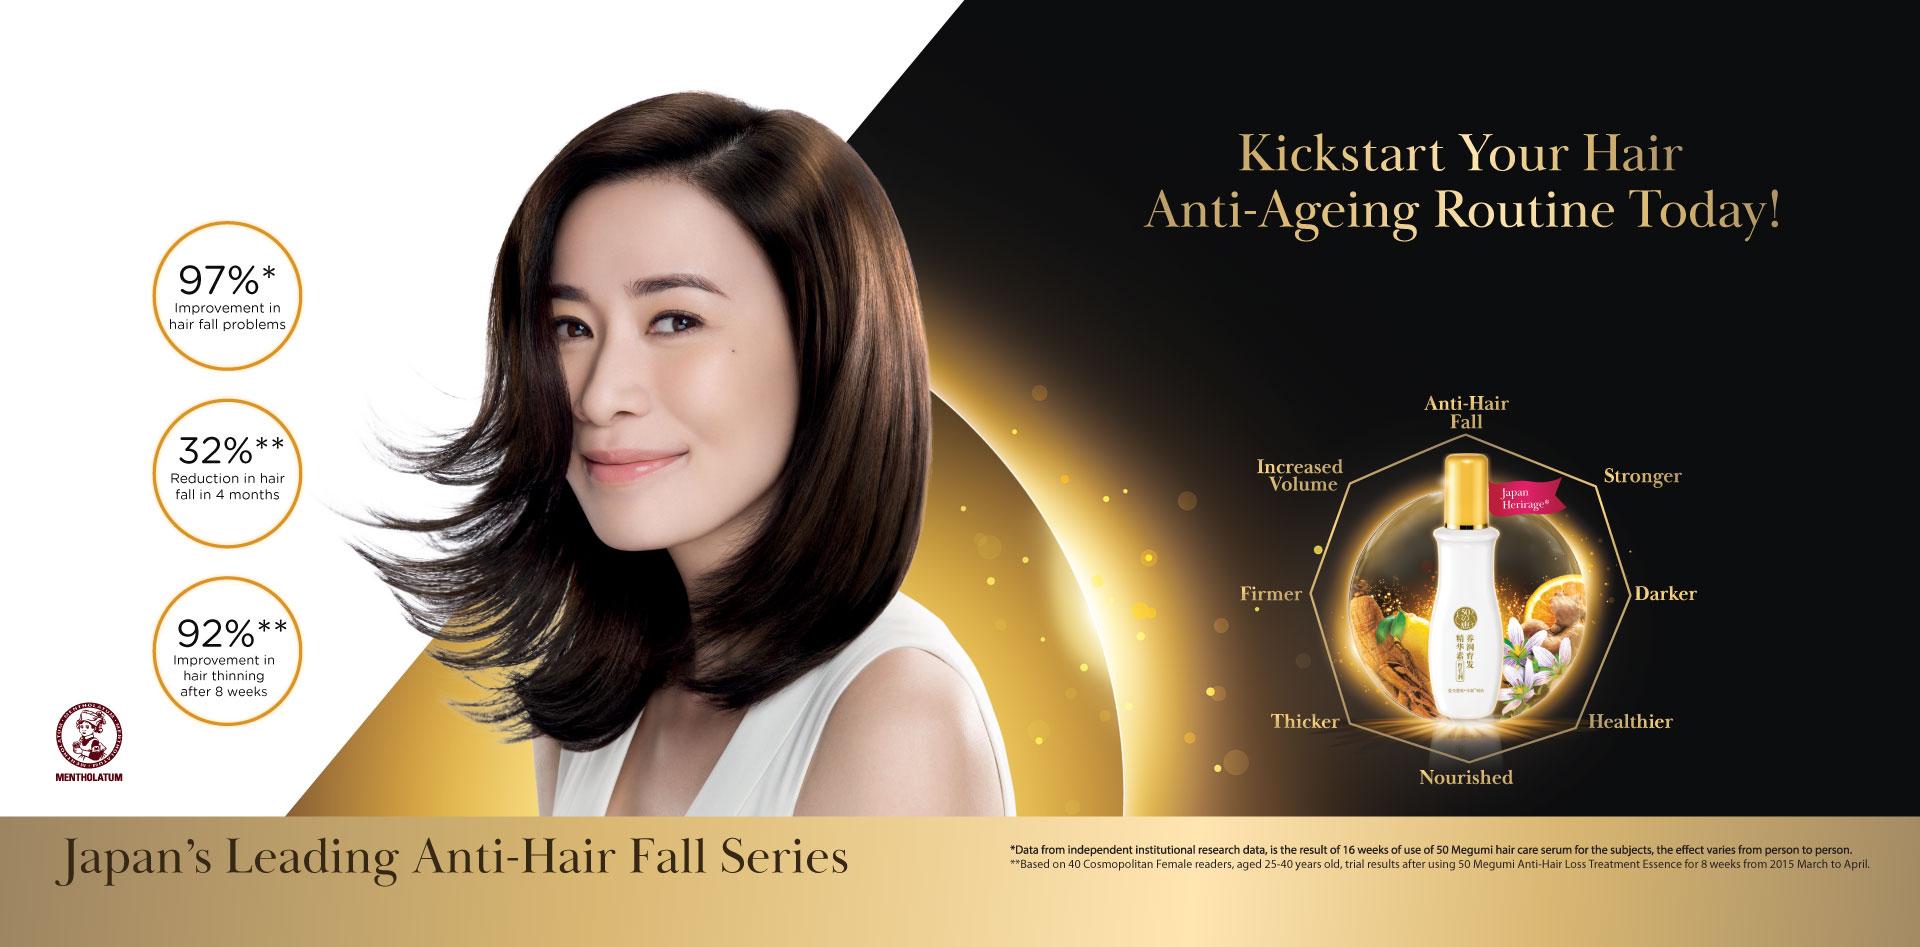 Japan's leading anti-hair loss series